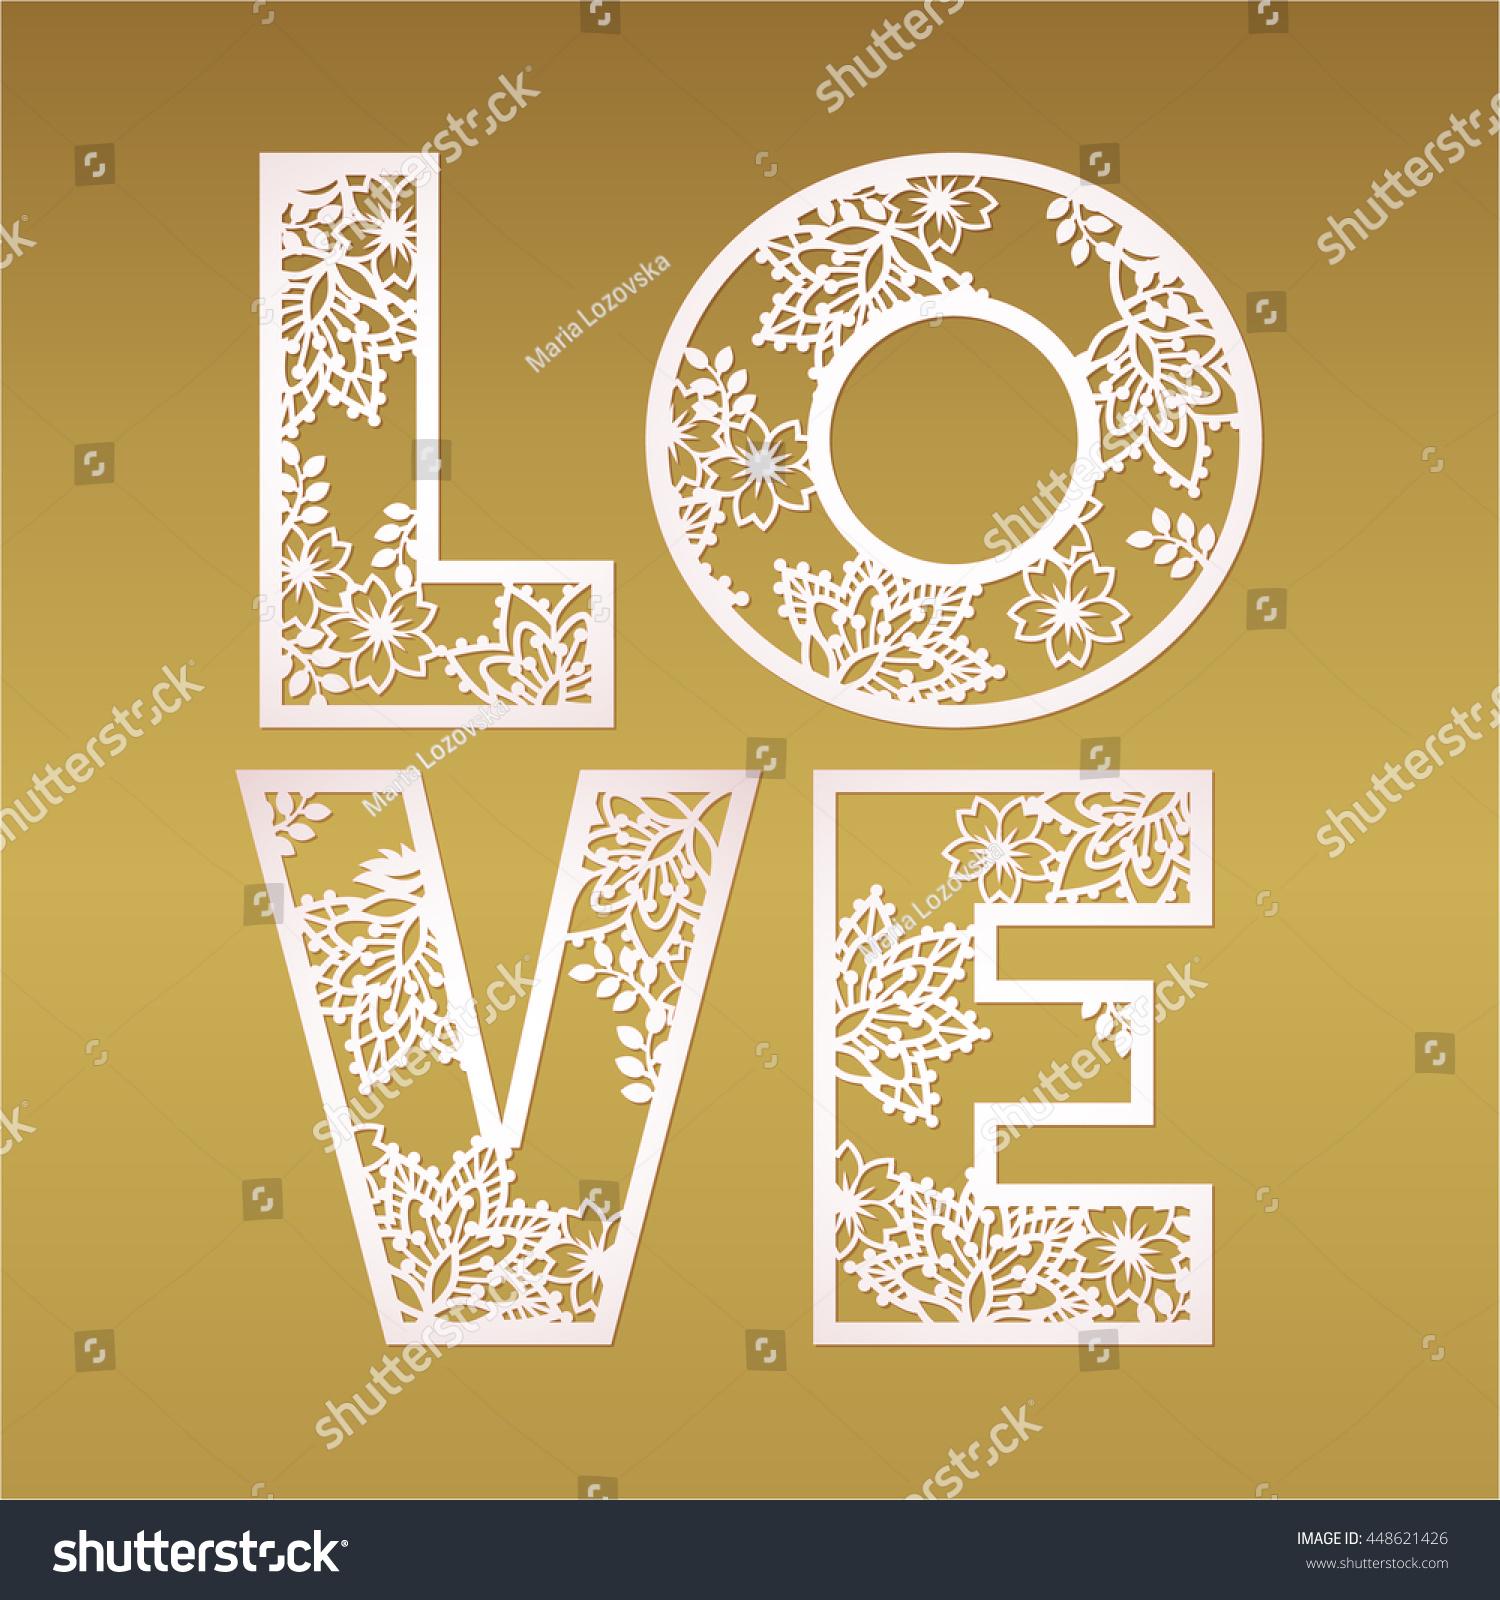 Paper Cutout Love Design Over Gold Stock Vector 448621426 Shutterstock